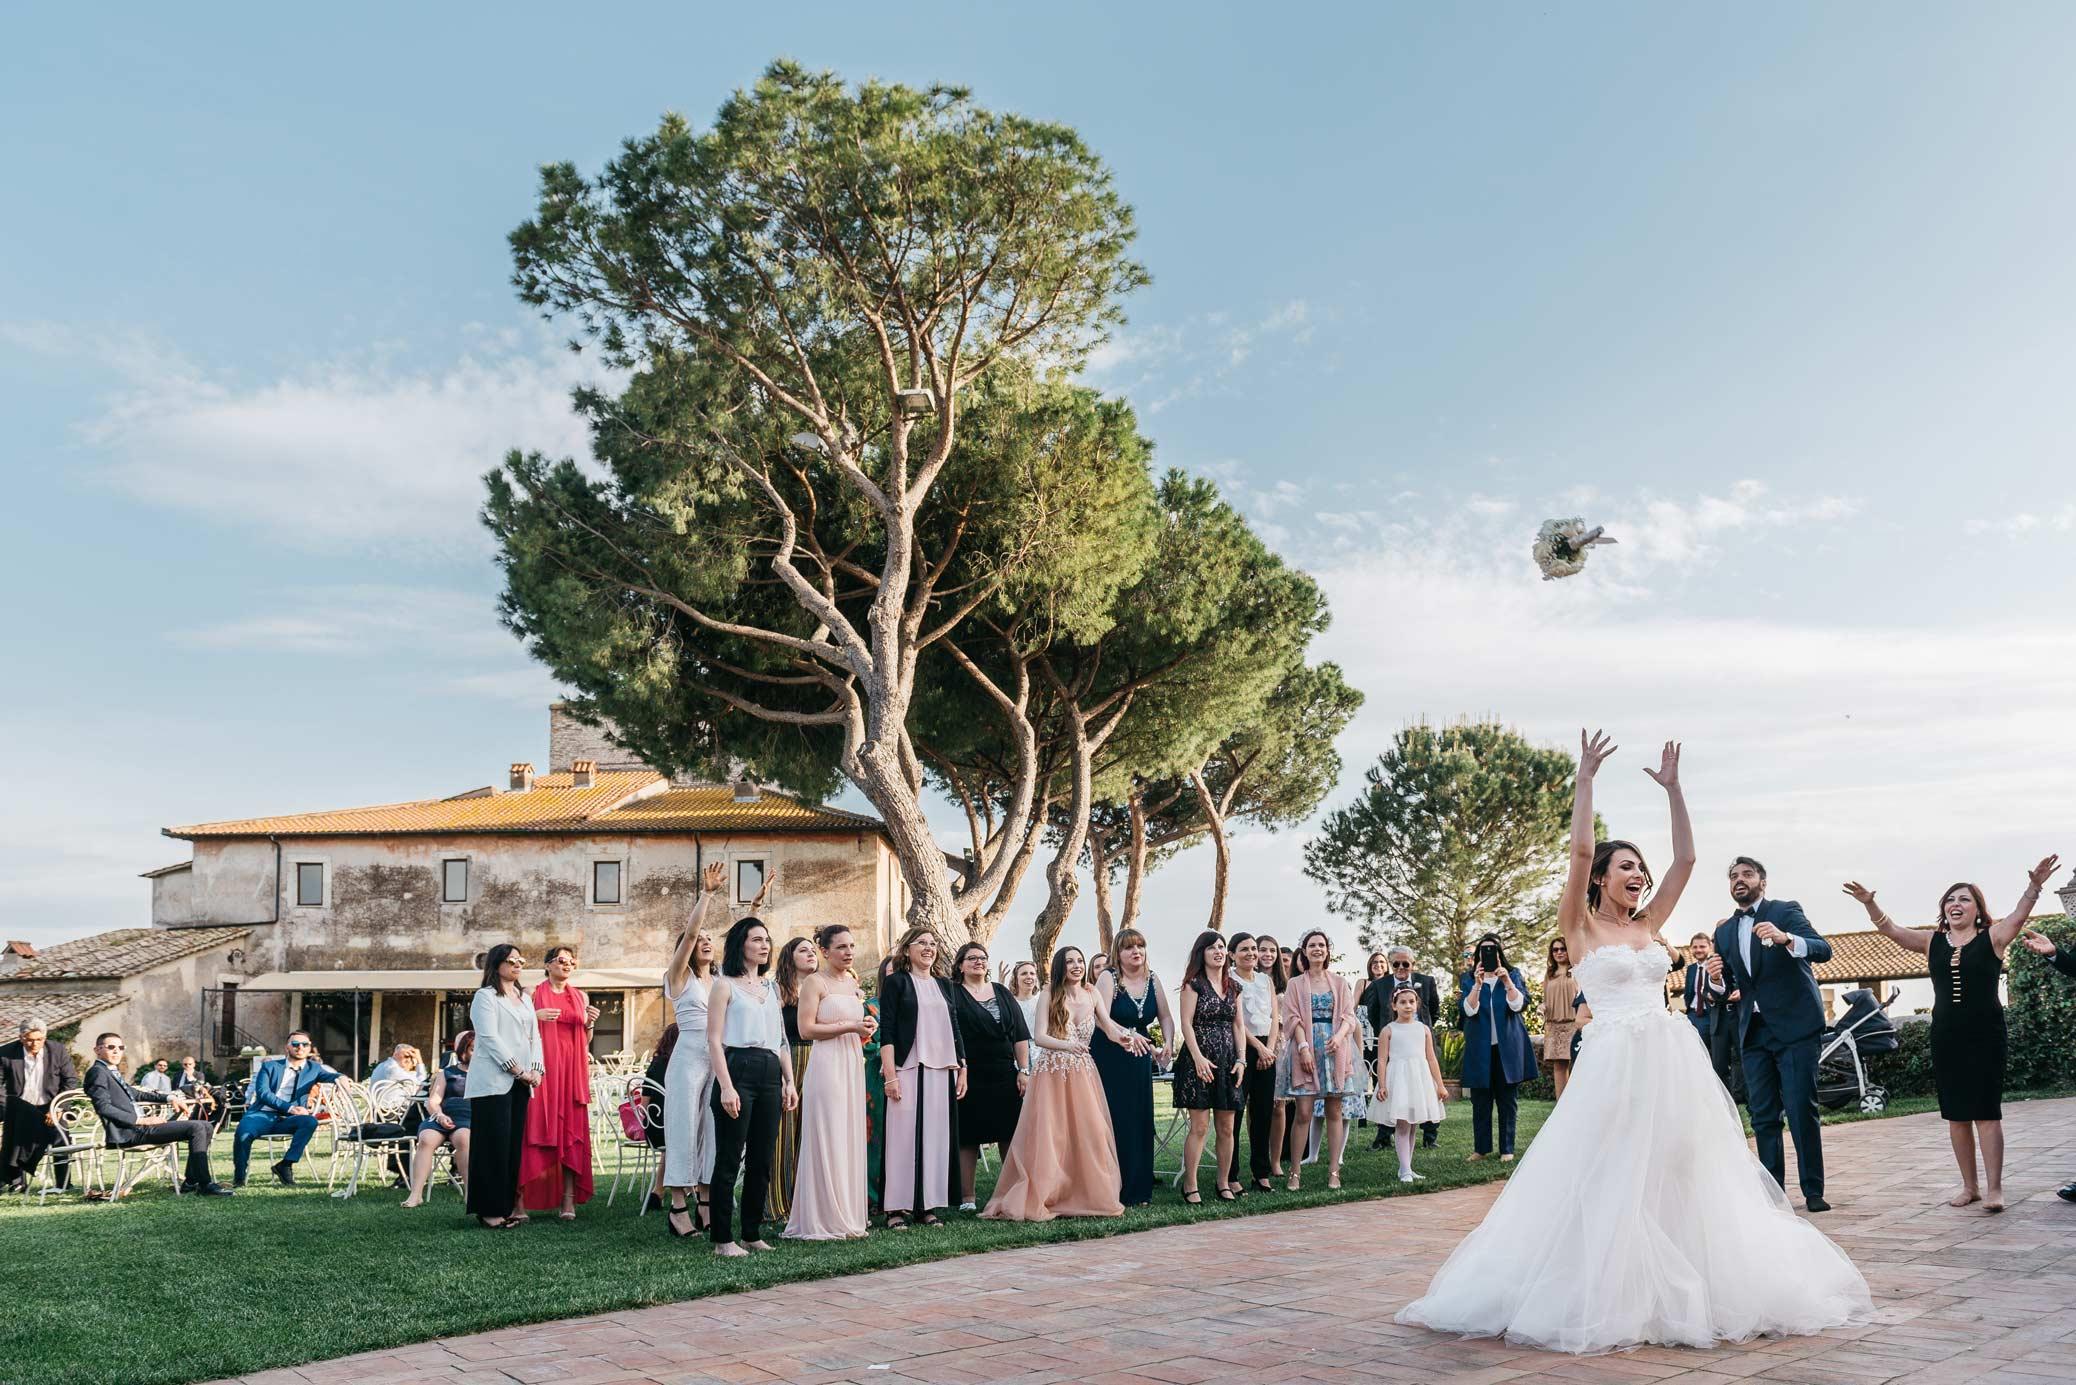 Fotografo-Matrimoni-Reportage-Ricevimento